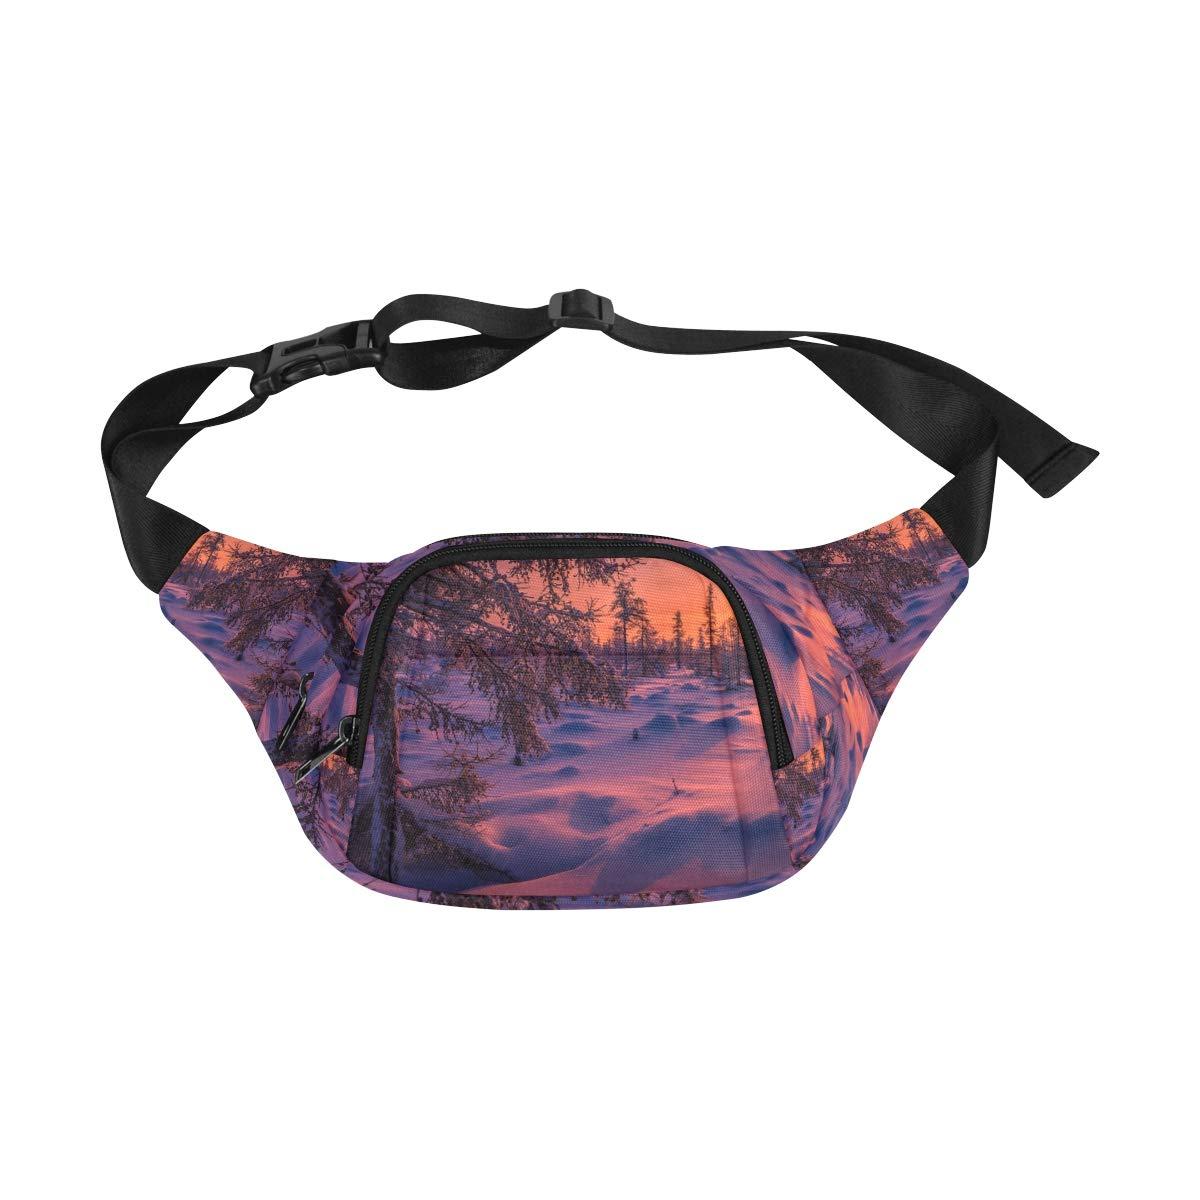 Winter Landscape With Forest Fenny Packs Waist Bags Adjustable Belt Waterproof Nylon Travel Running Sport Vacation Party For Men Women Boys Girls Kids